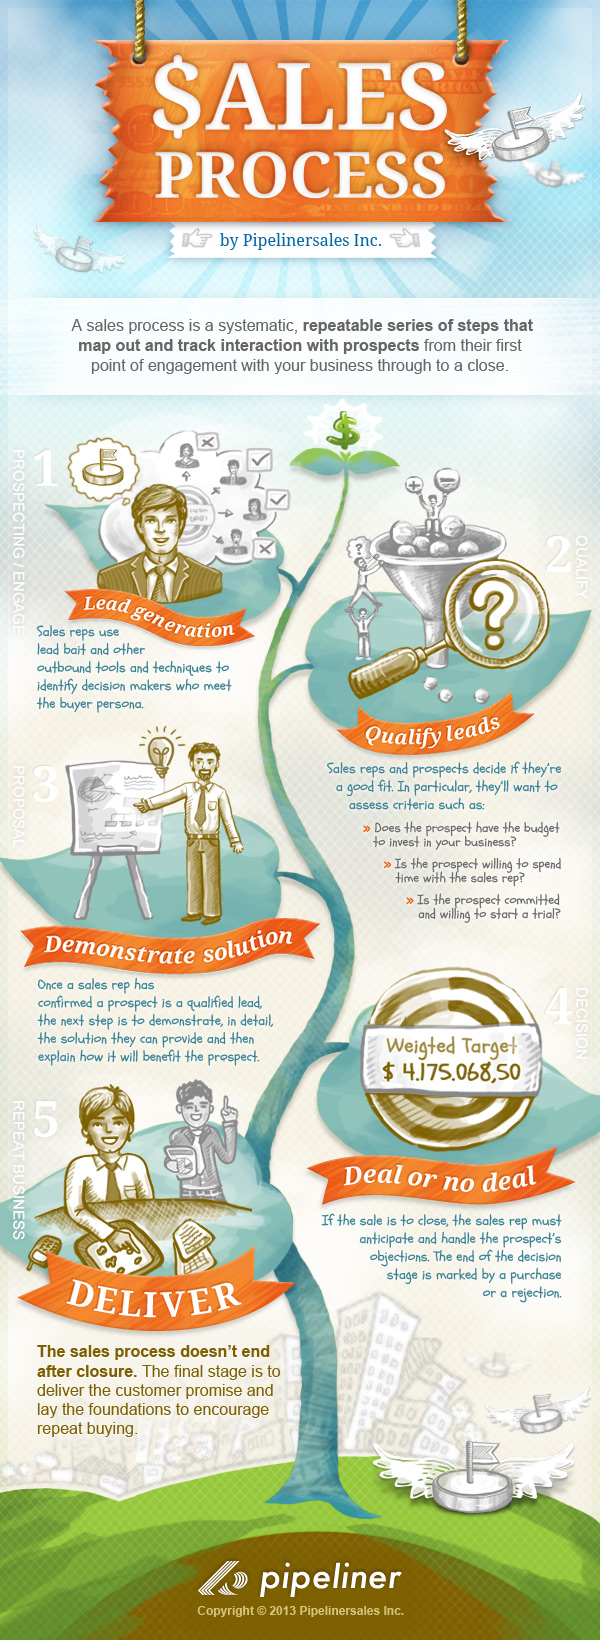 5-crucial-sales-process-steps--explained_525e5856d85eb